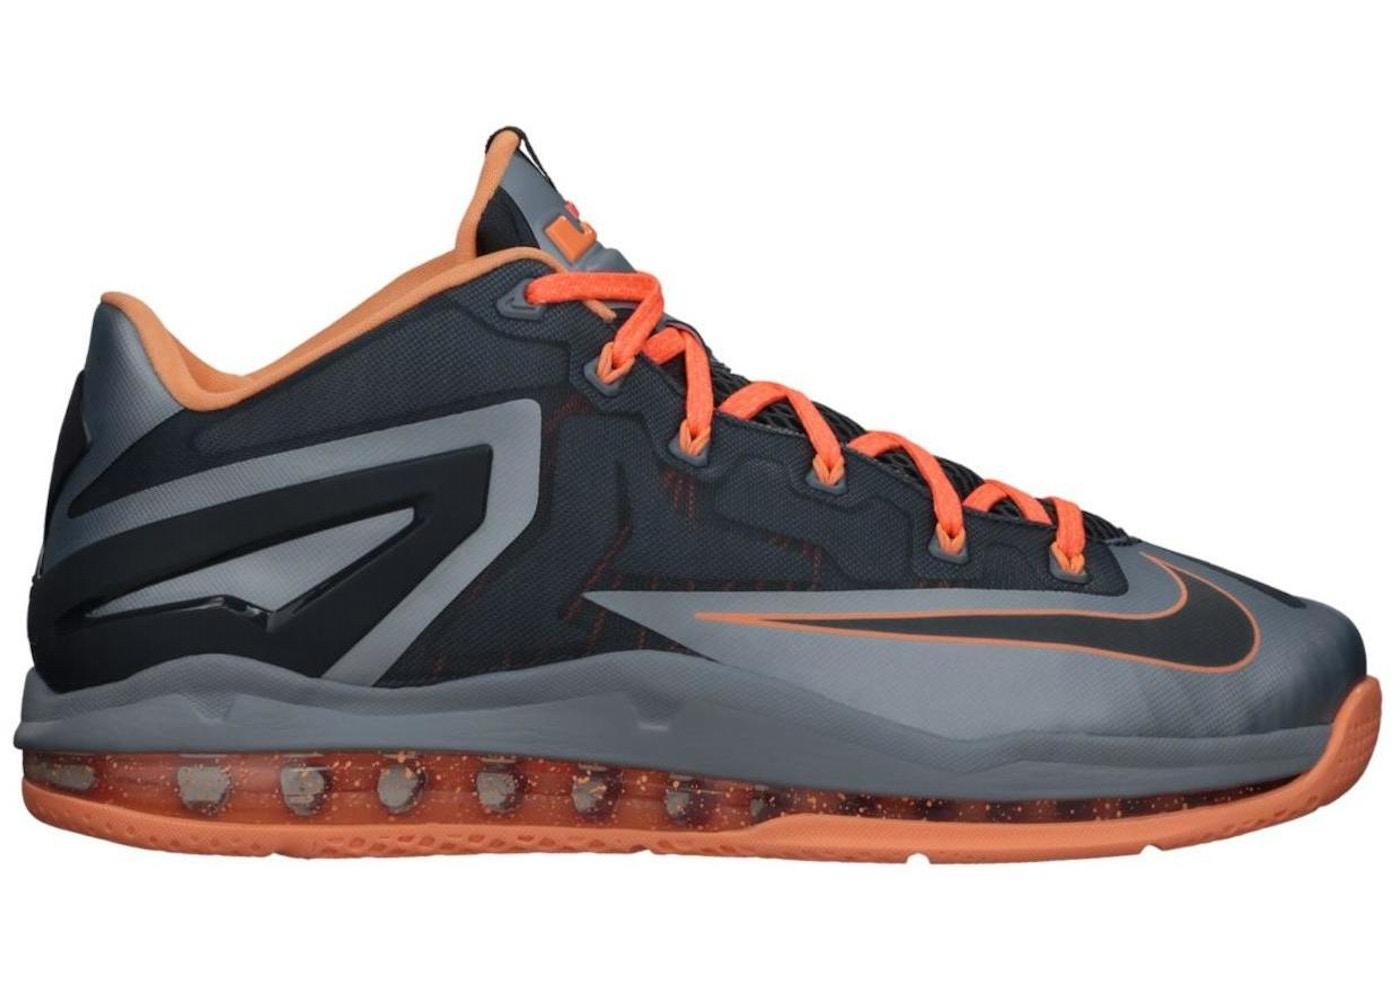 best sneakers 1e163 525fd LeBron 11 Low Magnet Grey